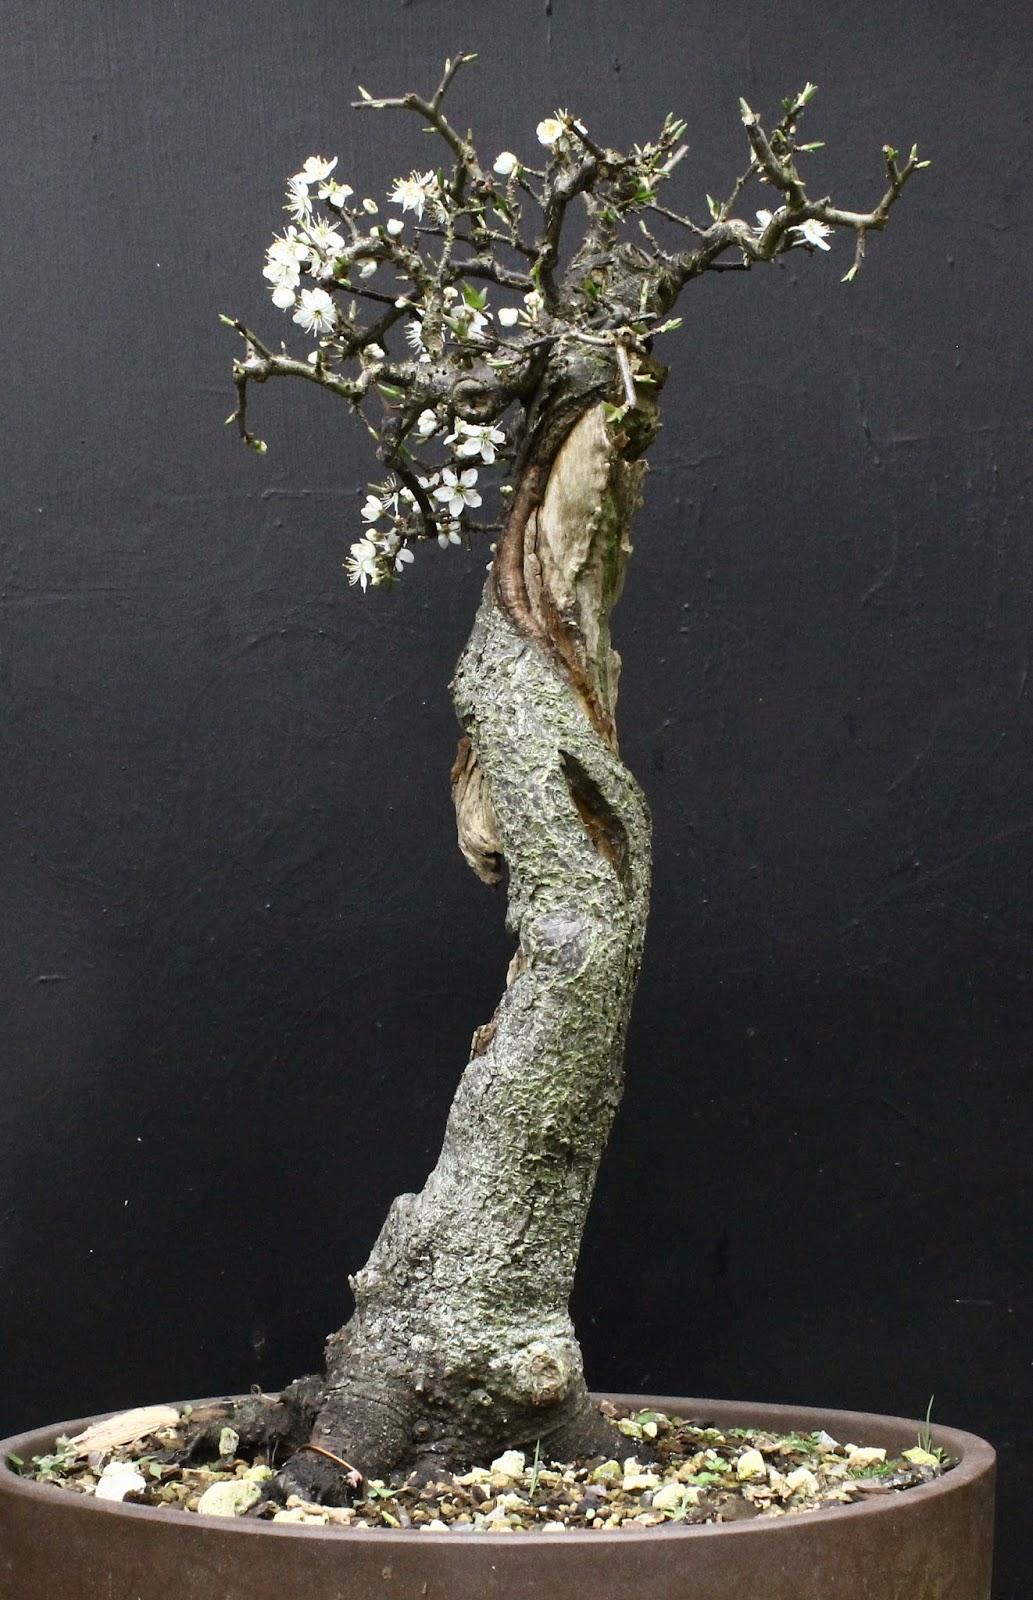 Wildwoodbonsai Blackthorn Prunus Spinosa From Urban Waste Ground